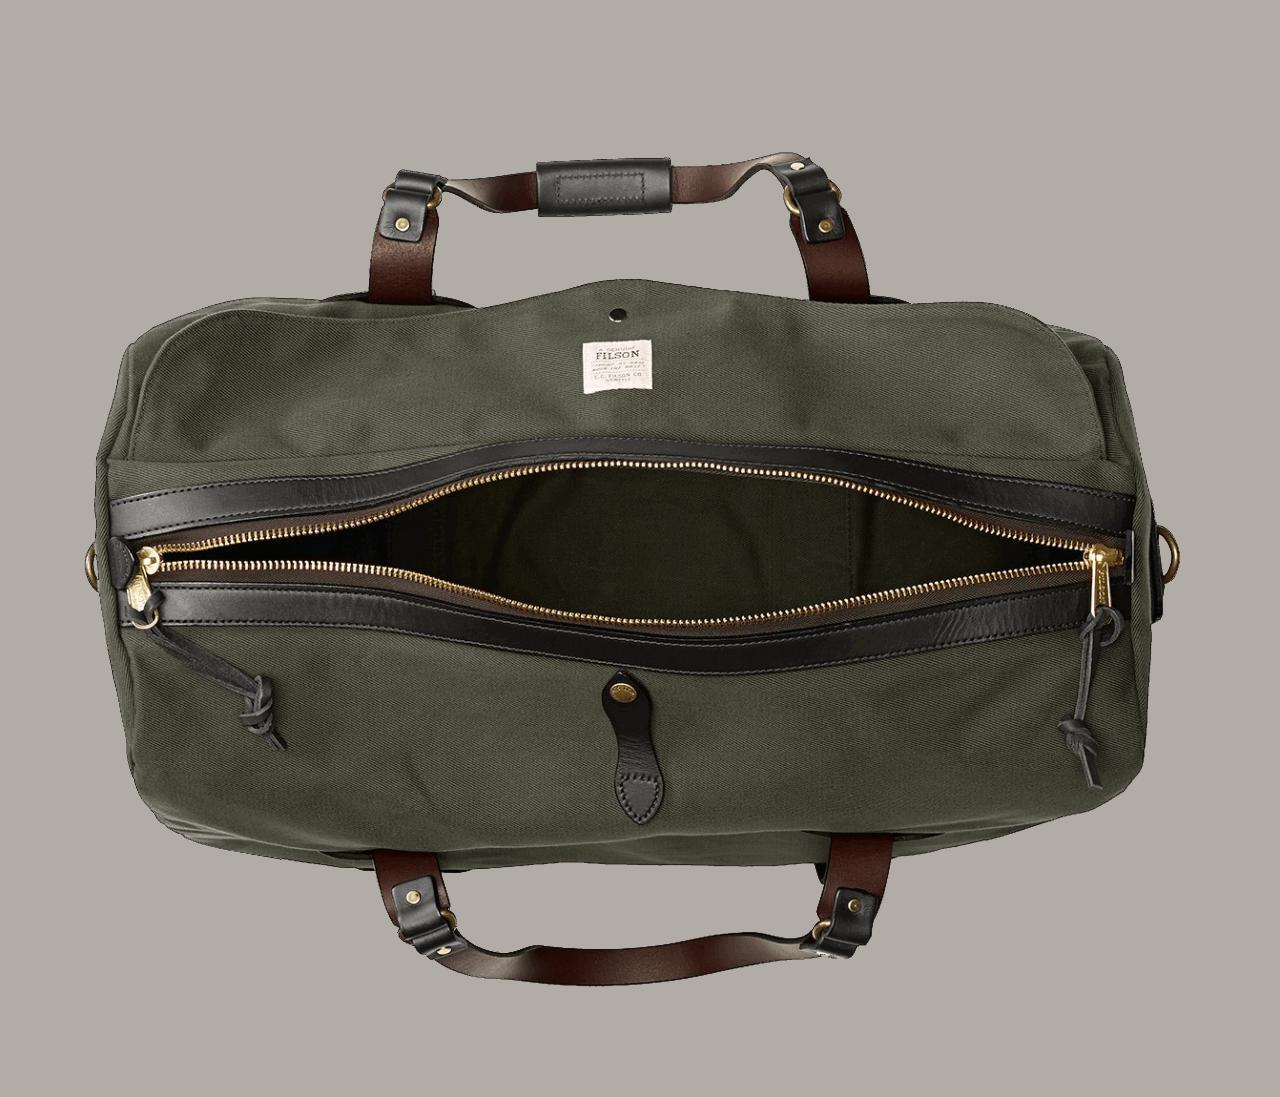 Filson Medium Rugged Twill Duffle Bag - Otter Green